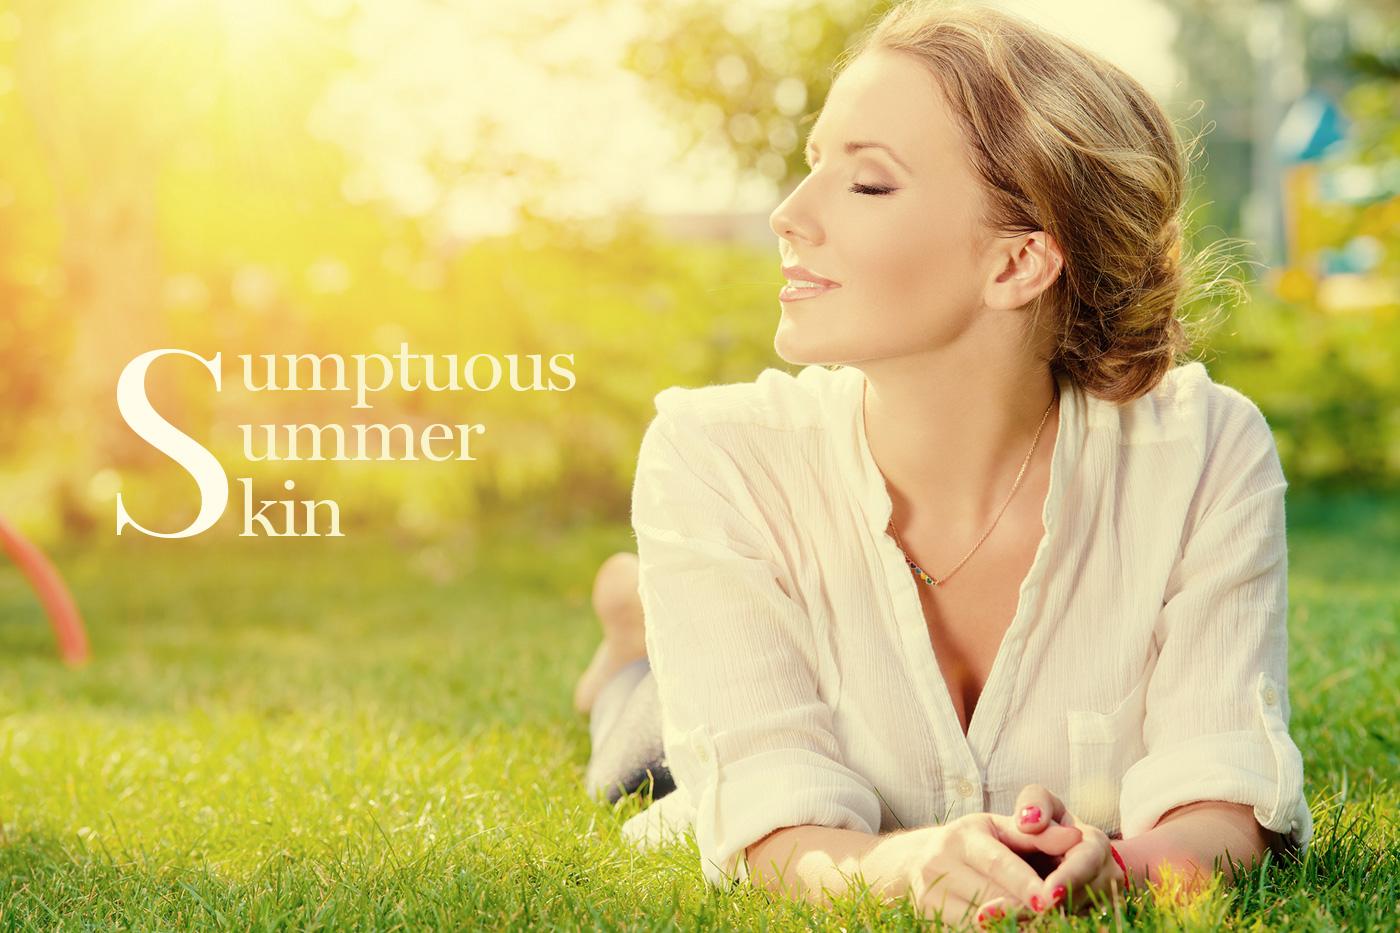 Sumptuous-Summer-Skin